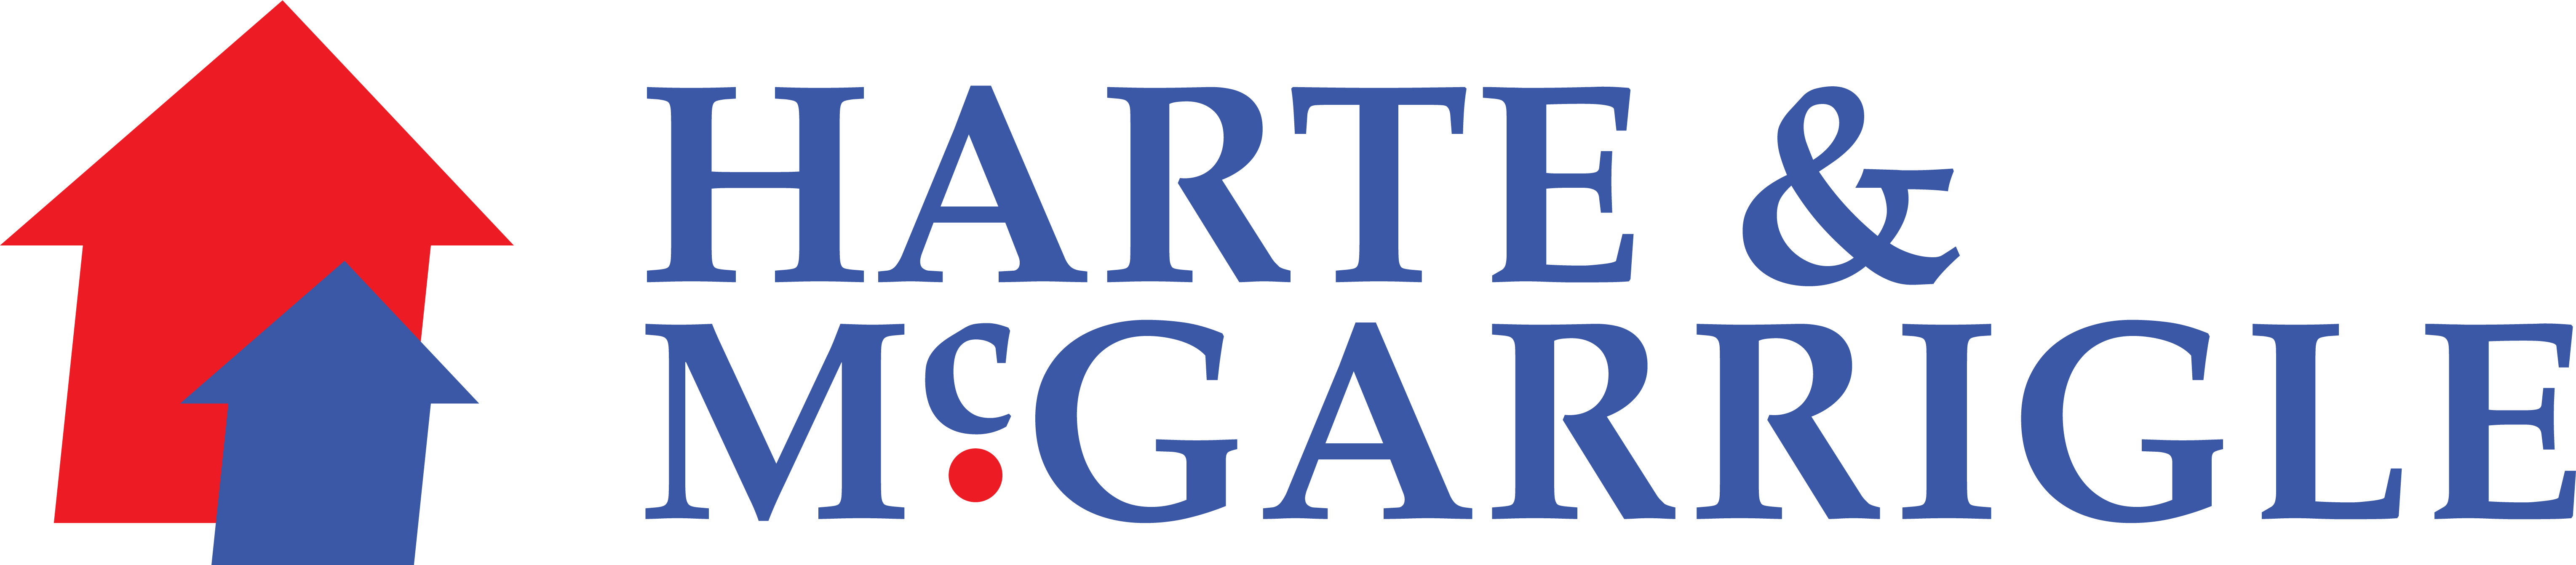 Harte & McGarrigle